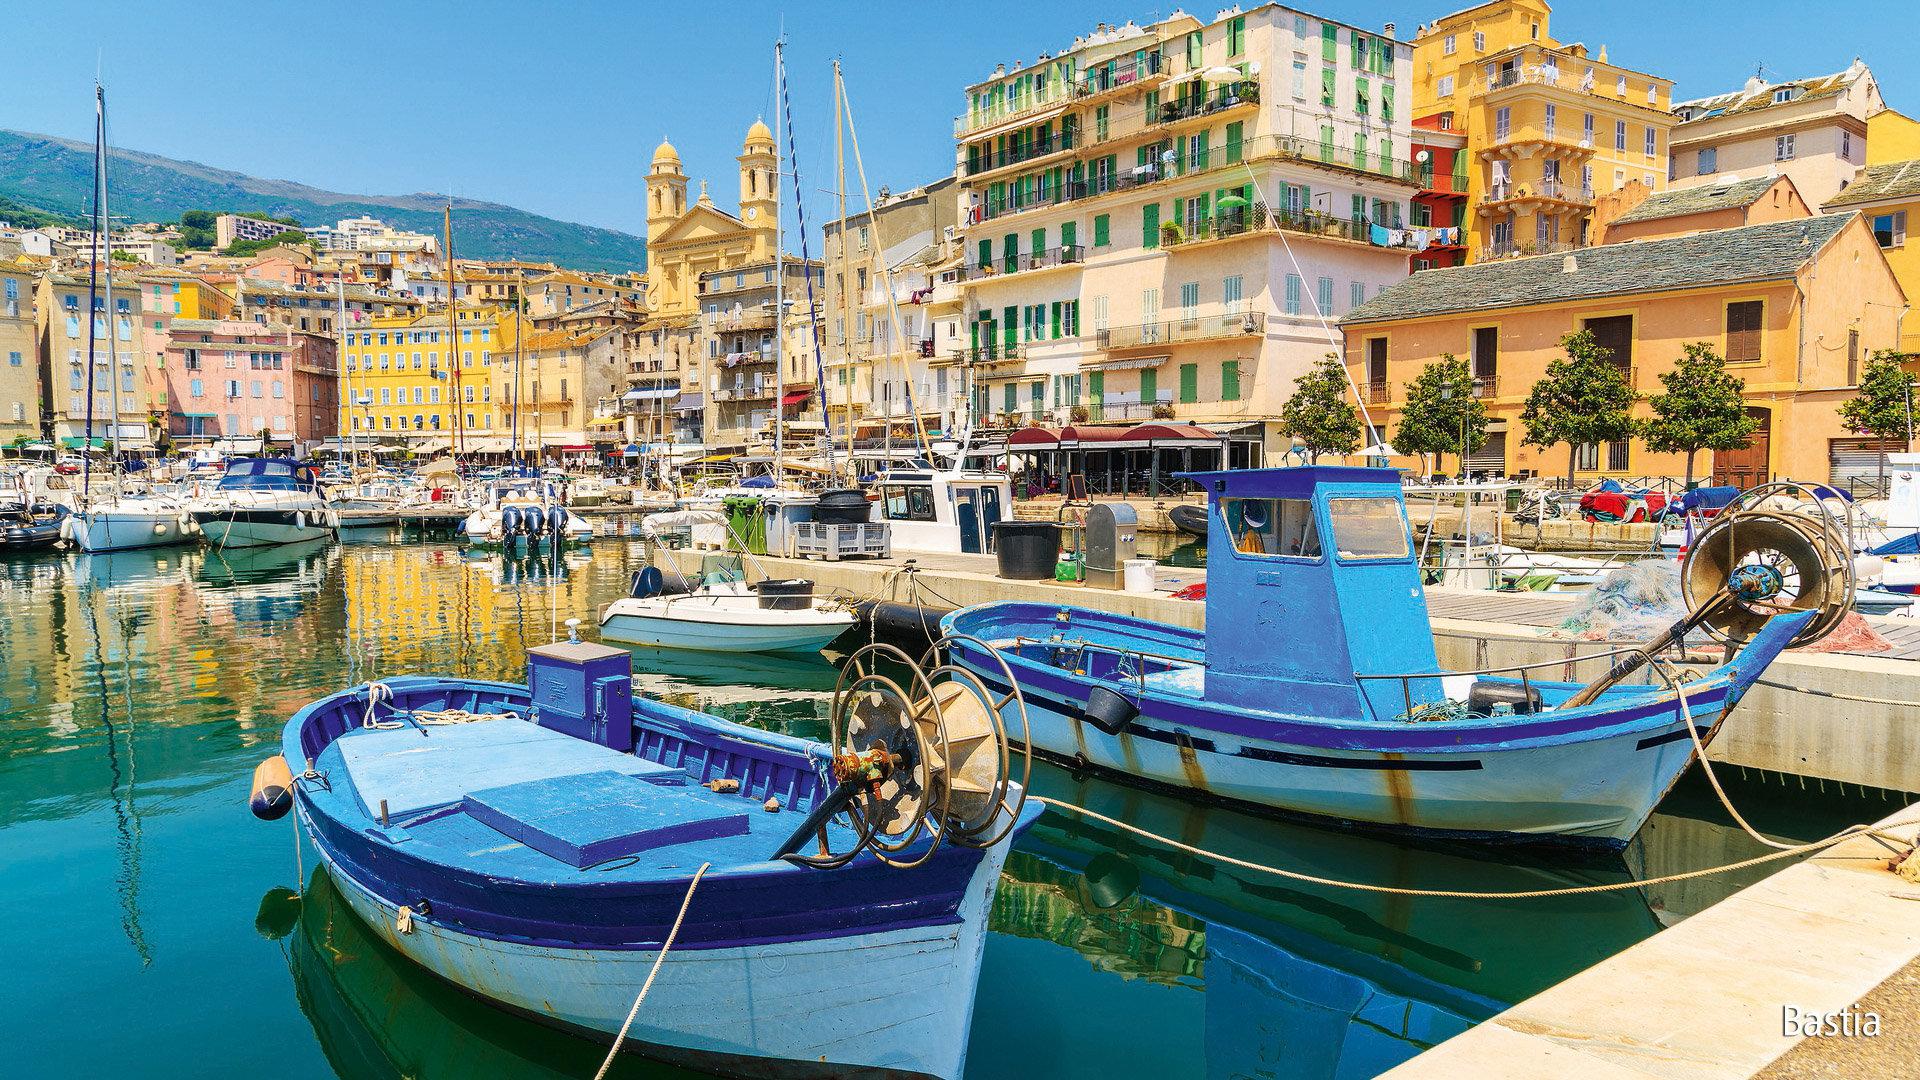 Corsica mon amour